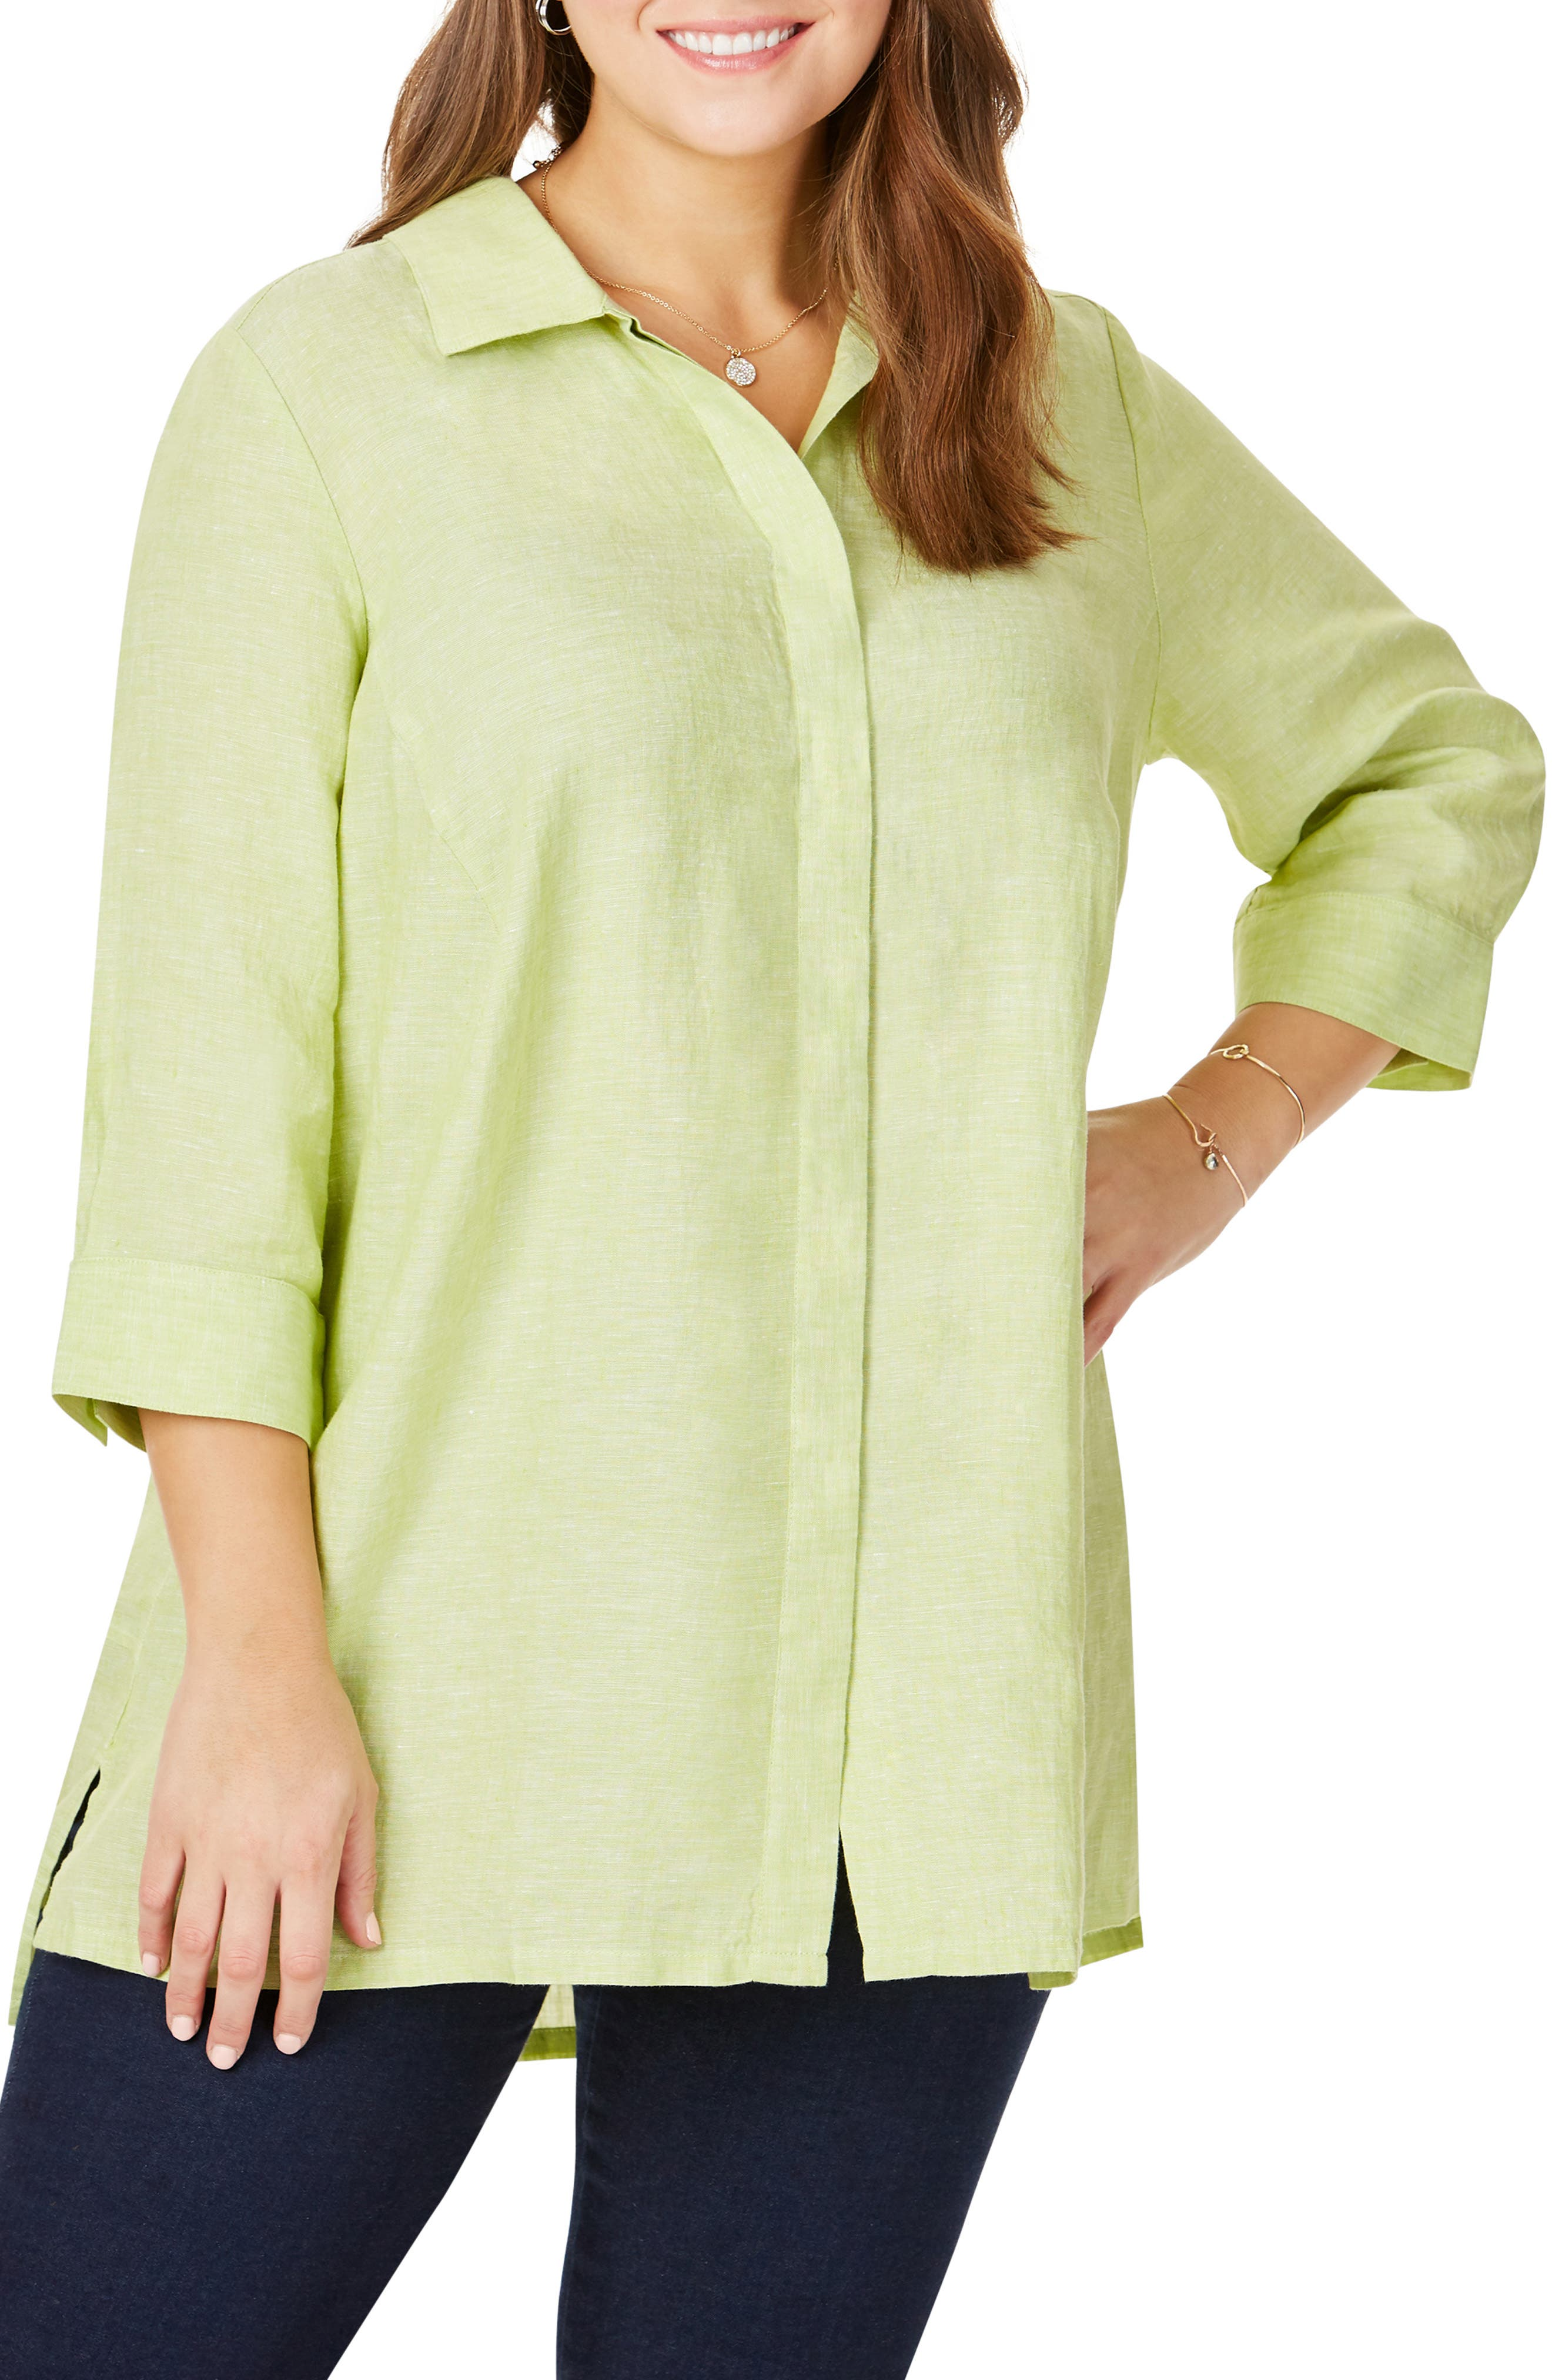 FOXCROFT, Chambray Linen Tunic Shirt, Main thumbnail 1, color, MARGARITA